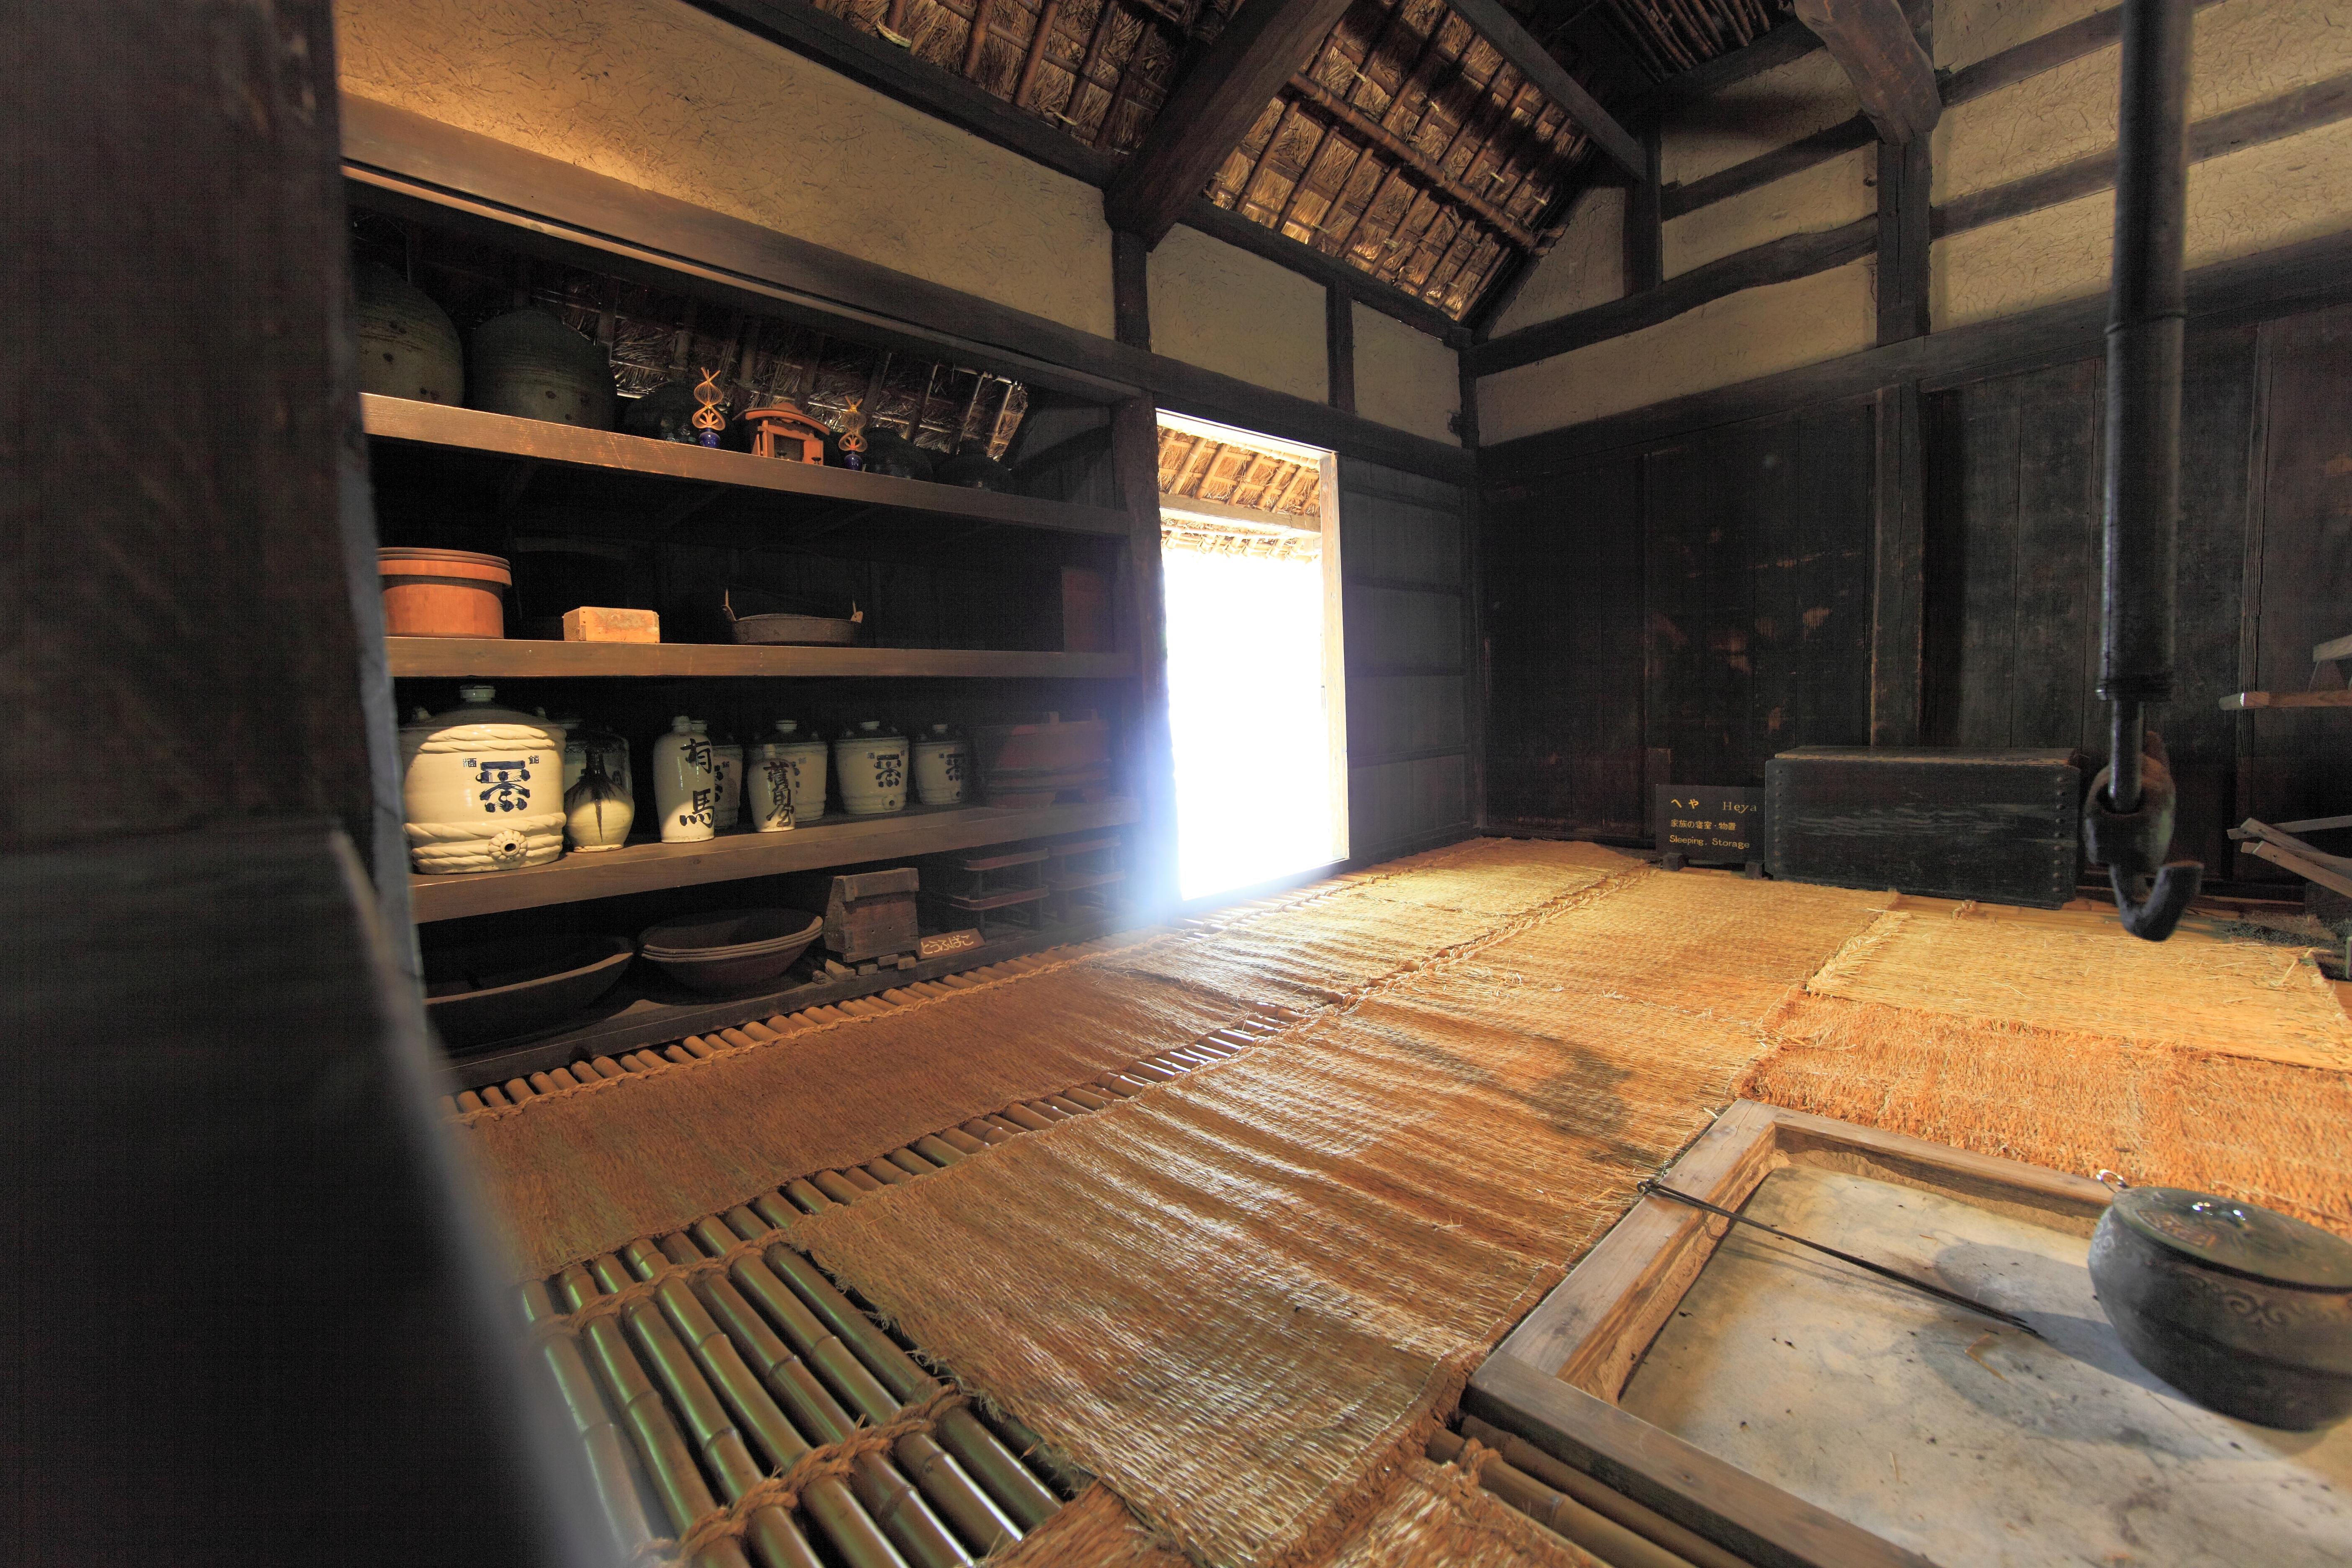 Gambar Kayu Rumah Lantai Pedalaman Tinggi Kuno Tempat